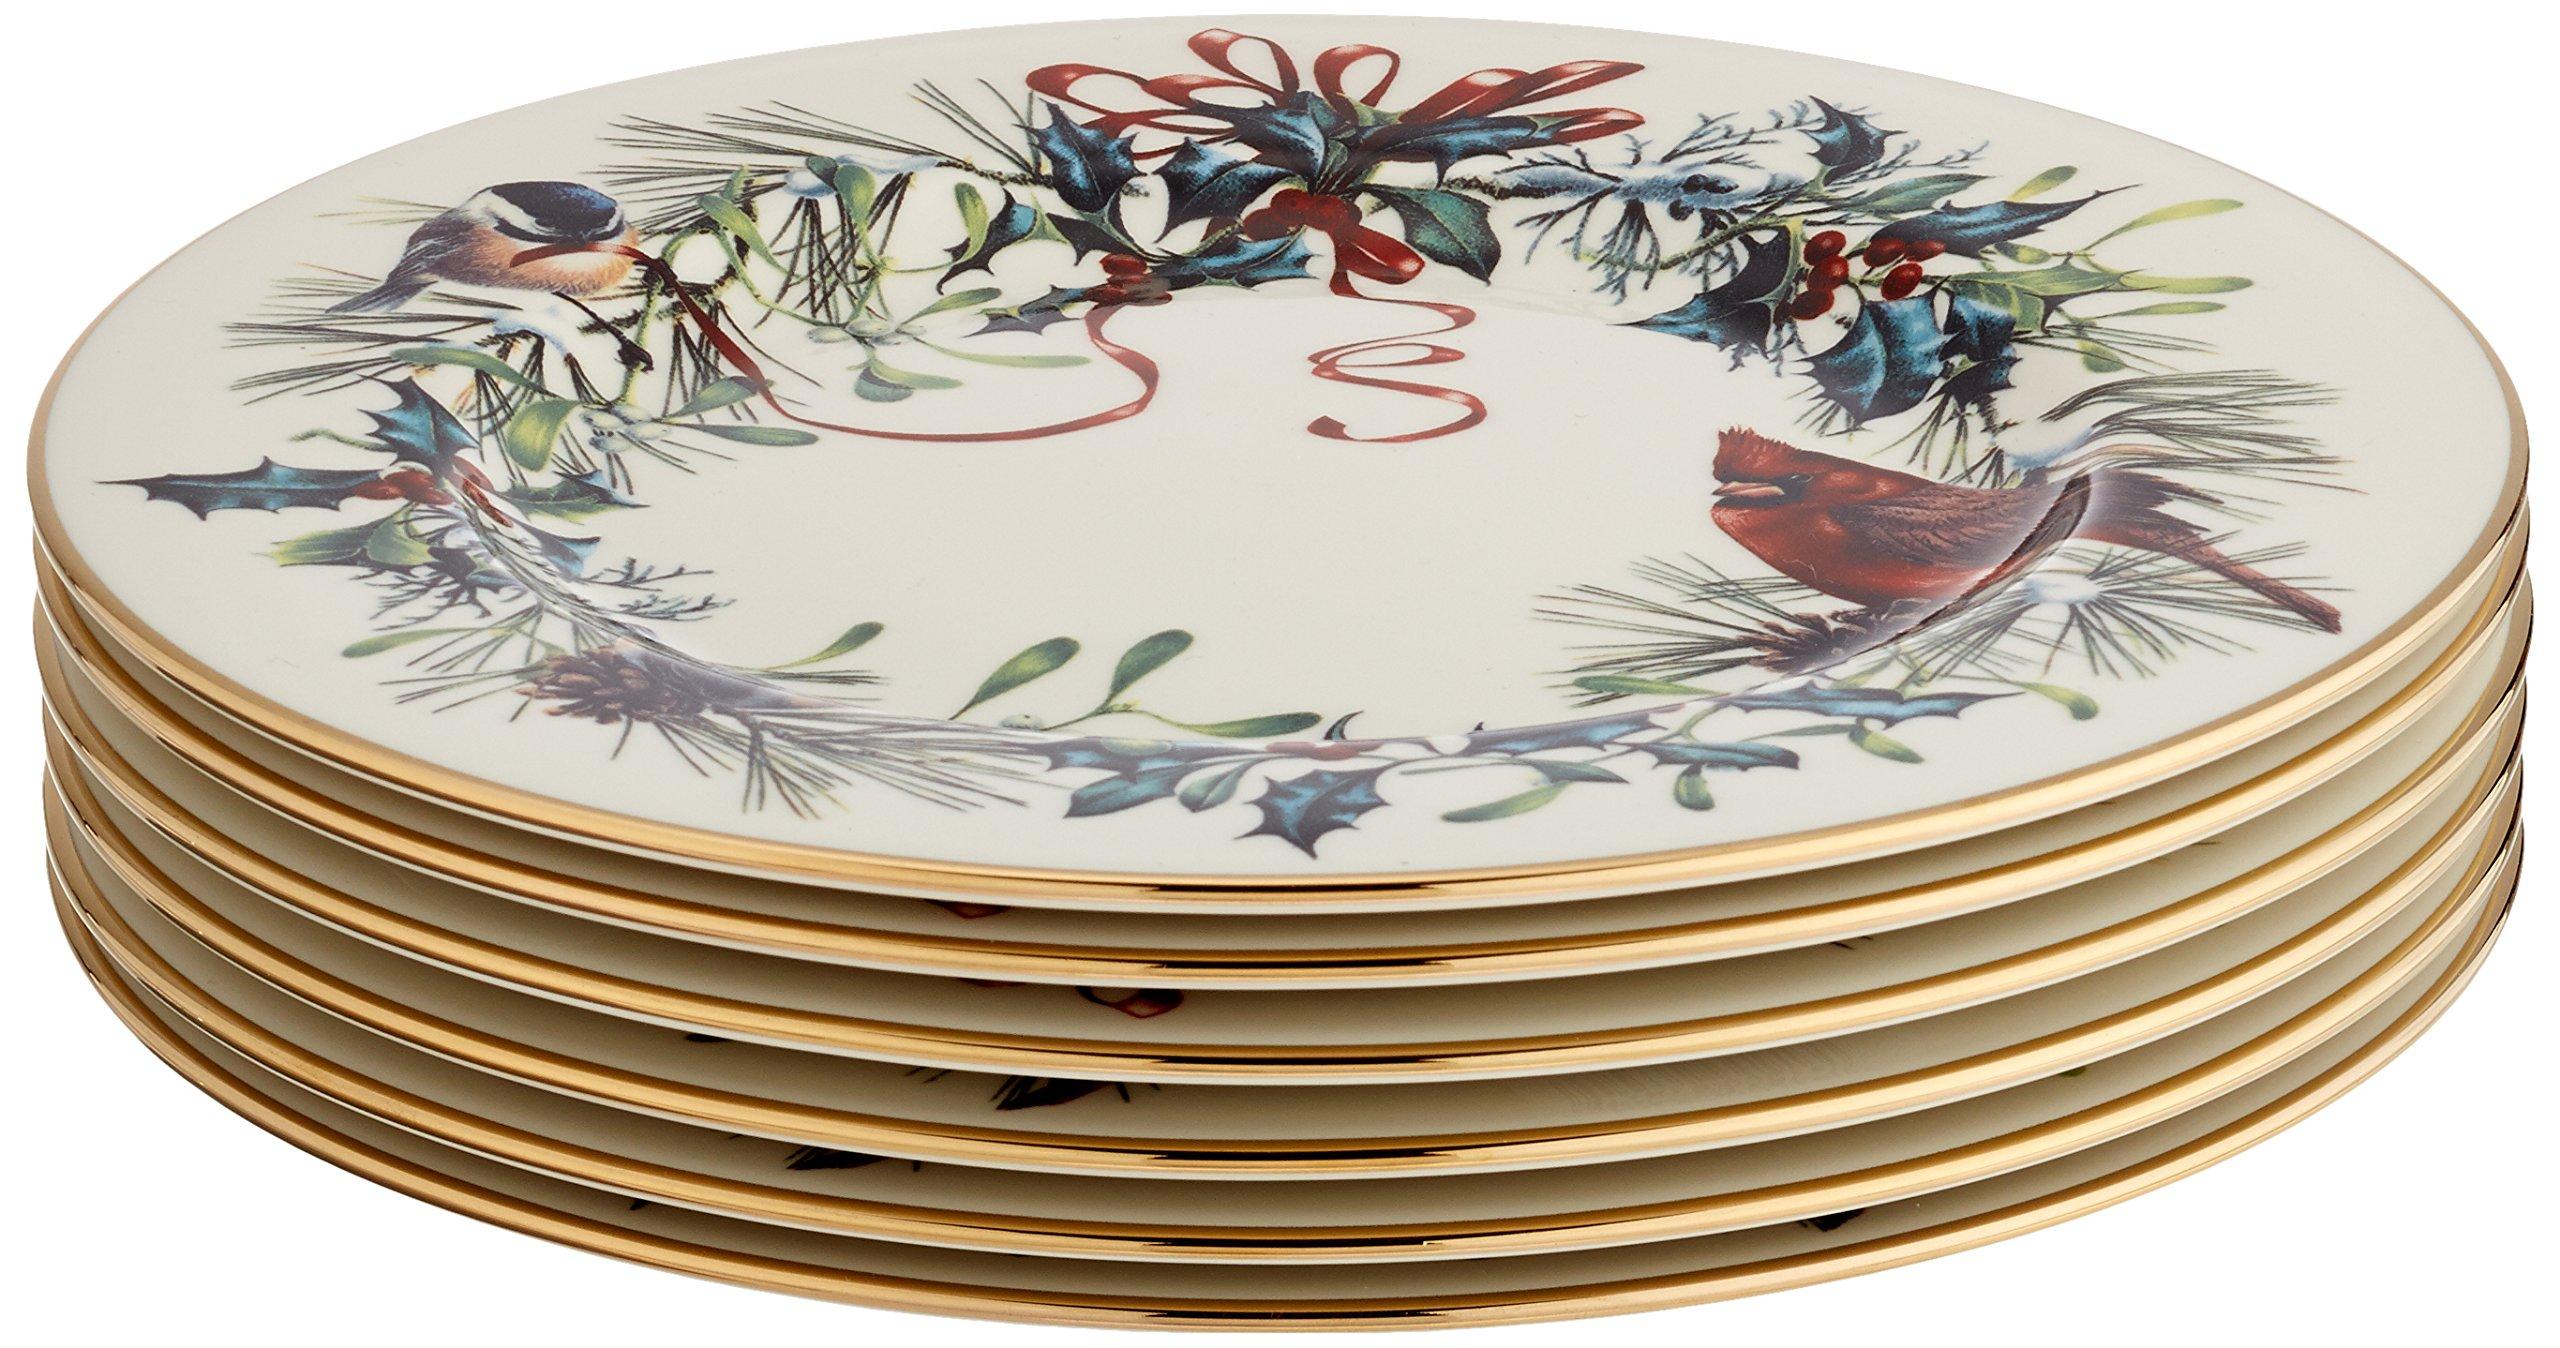 Lenox Winter Greetings Set of 6 Salad Plates,Ivory by Lenox (Image #3)